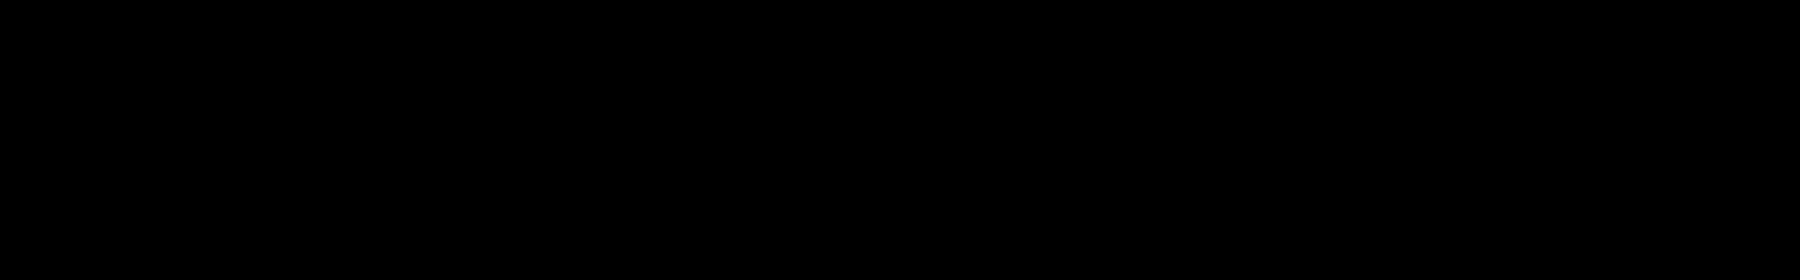 Genesis - Omnisphere Bank audio waveform